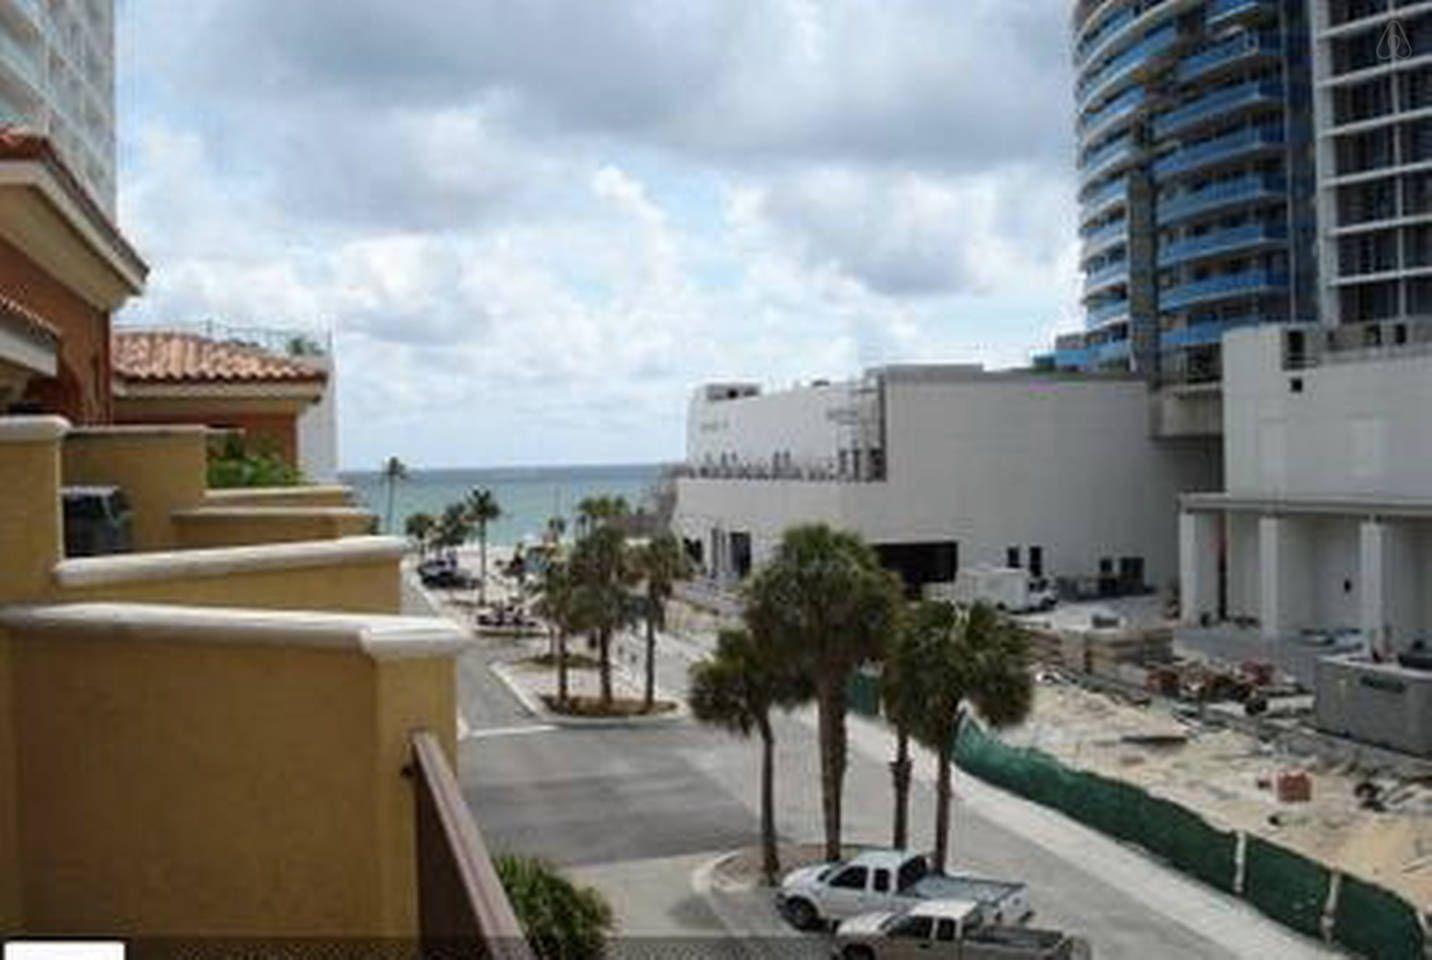 Posh Ft Lauderdale Beach Strip Th In Fort Lauderdale Florida Vacation Rentals Condos In Florida Lauderdale Beach